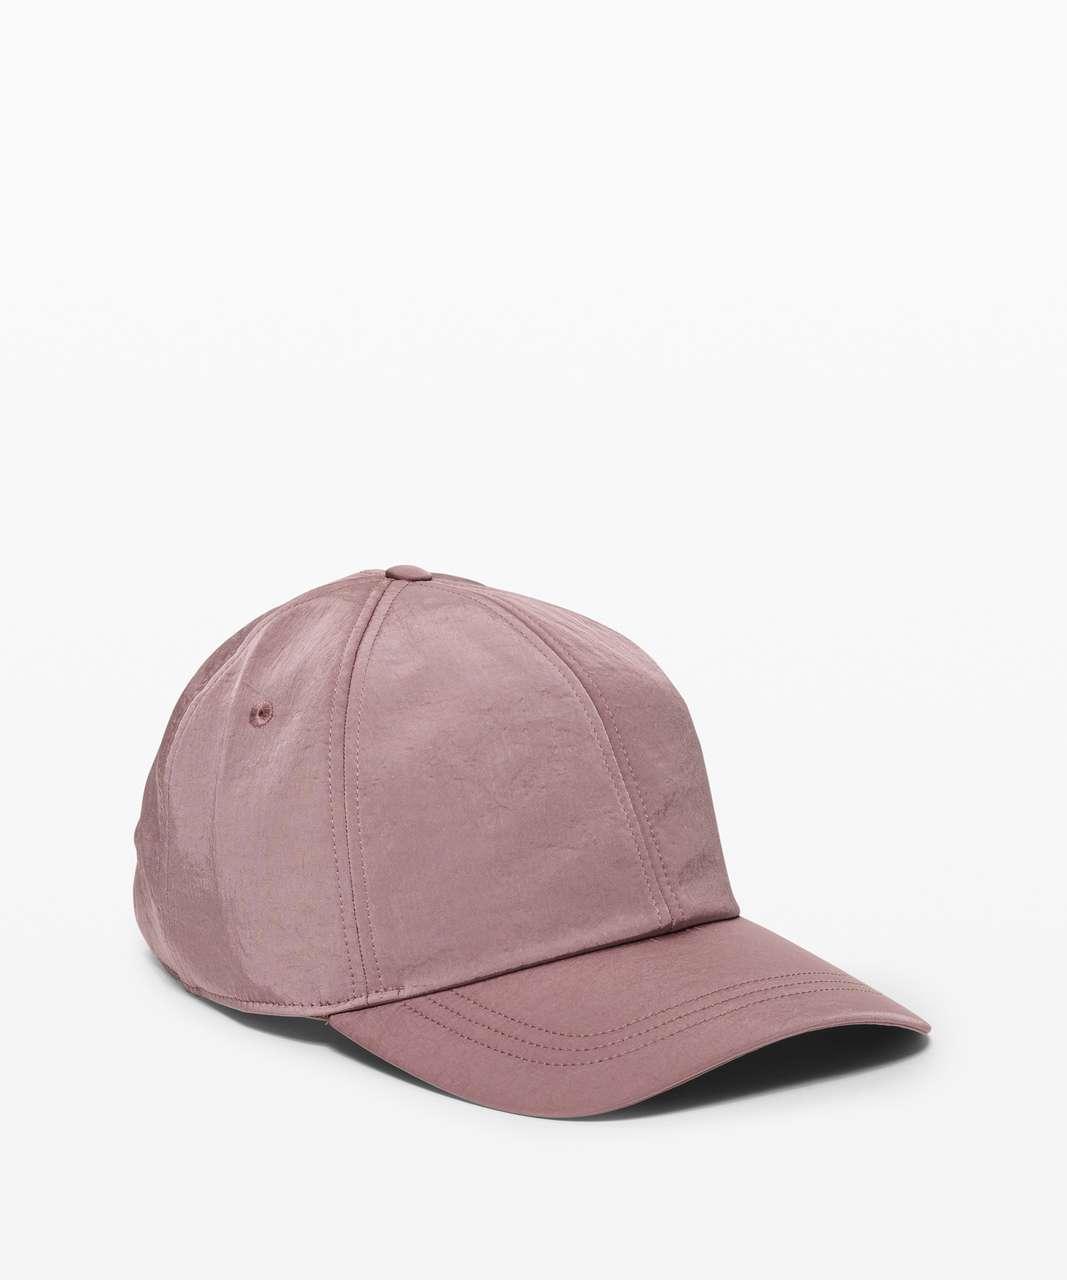 Lululemon Baller Hat II *Soft - Misty Mocha